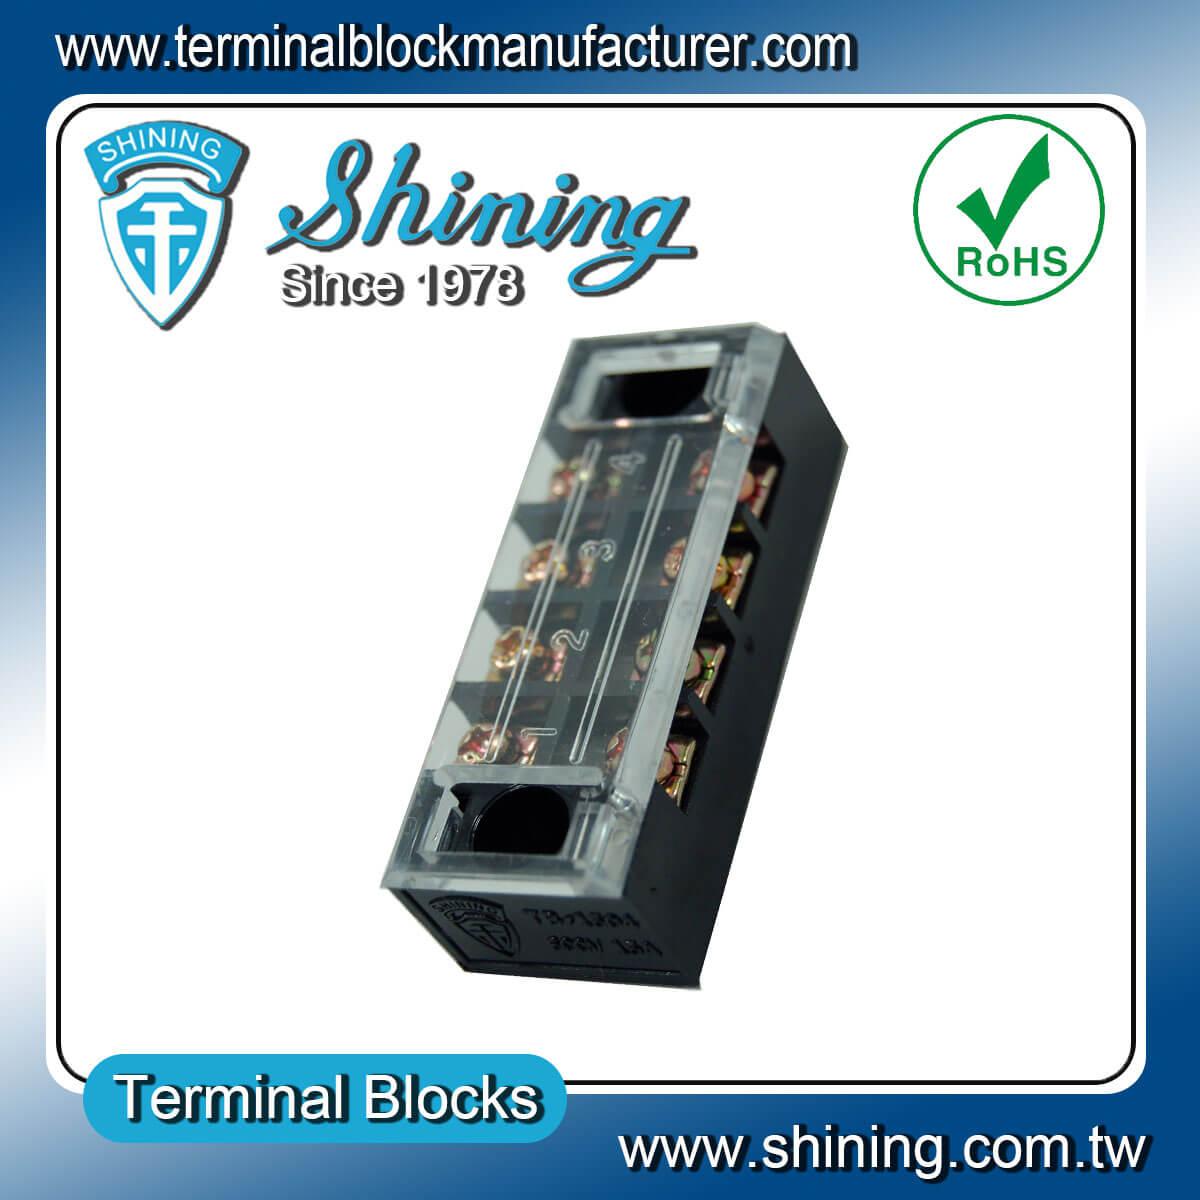 TB-3504 600V 35A 4Pole固定式柵欄端子台